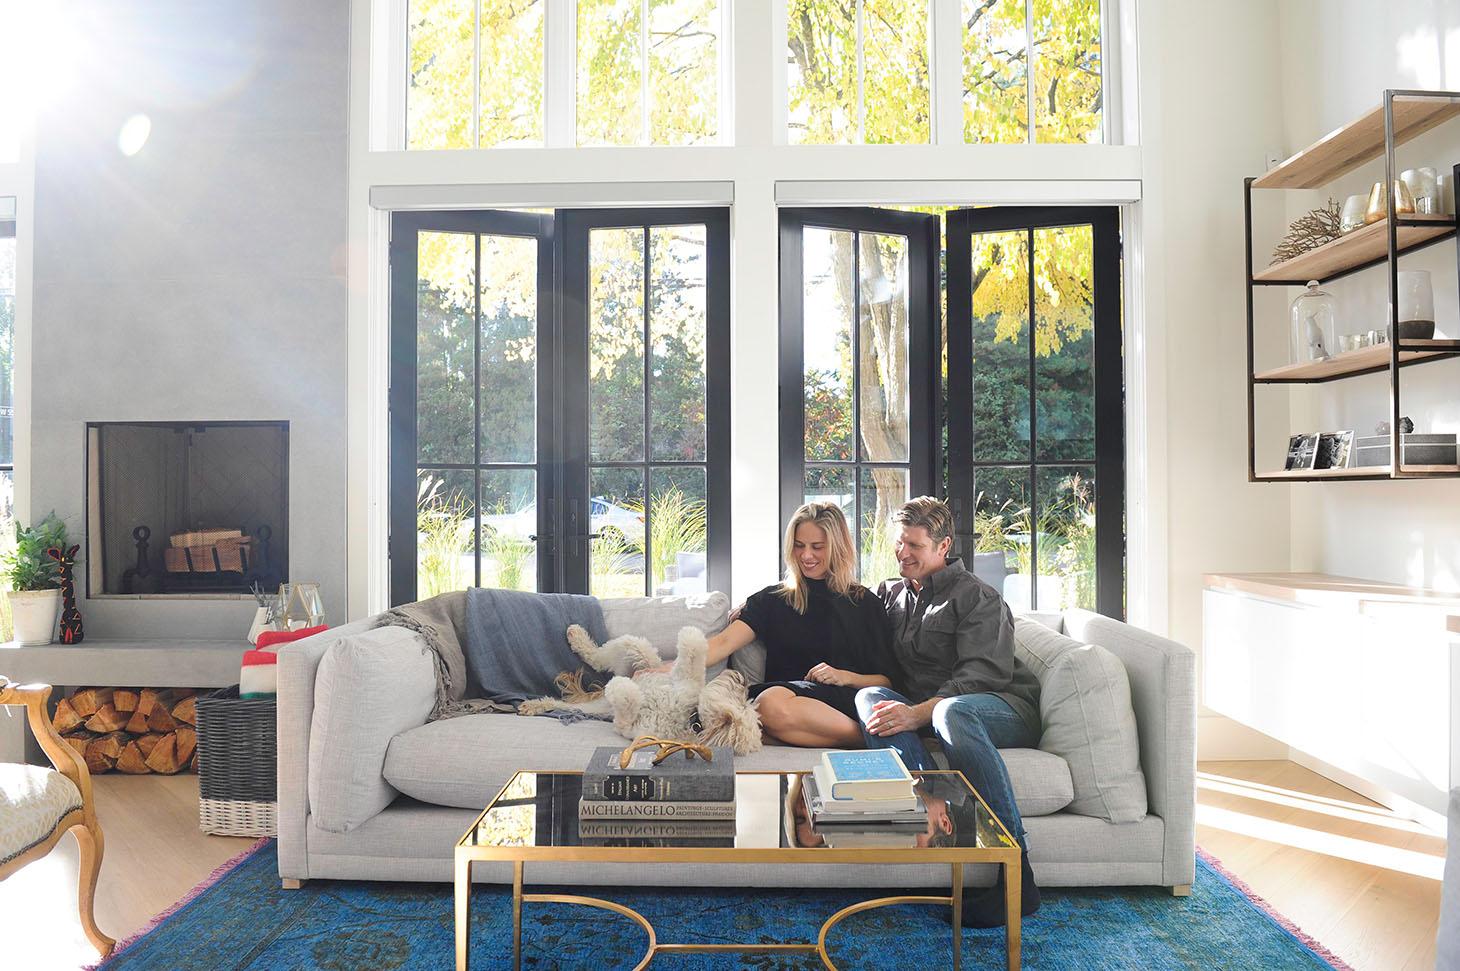 Jillian-Harris-Update-on-Kenny-and-Michelle-Gemmills-Home-Renovation-15.jpg